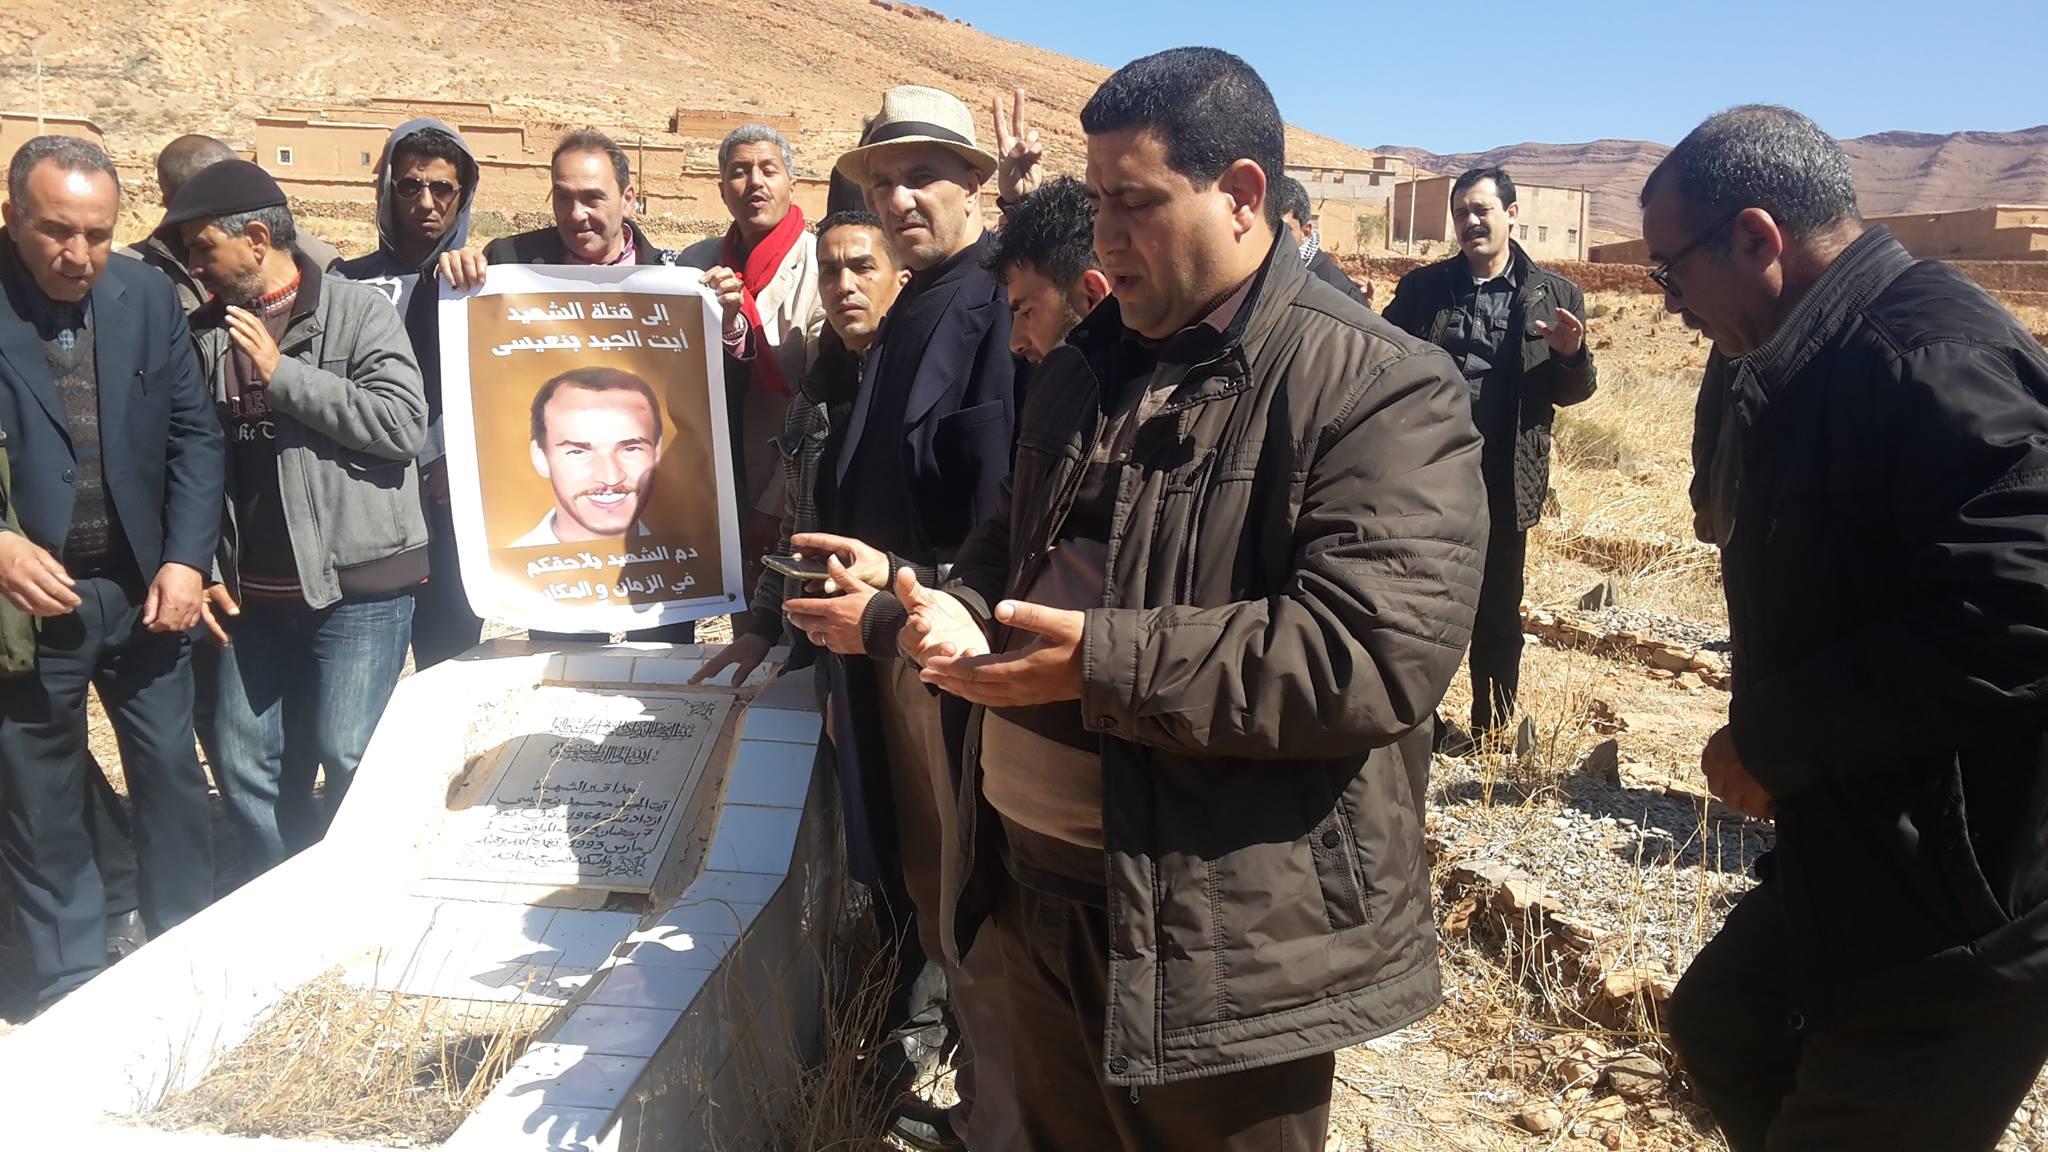 Photo of أسرة آيت الجيد للأحزاب السياسية: اغتيال ابننا مسؤولية على عاتقكم